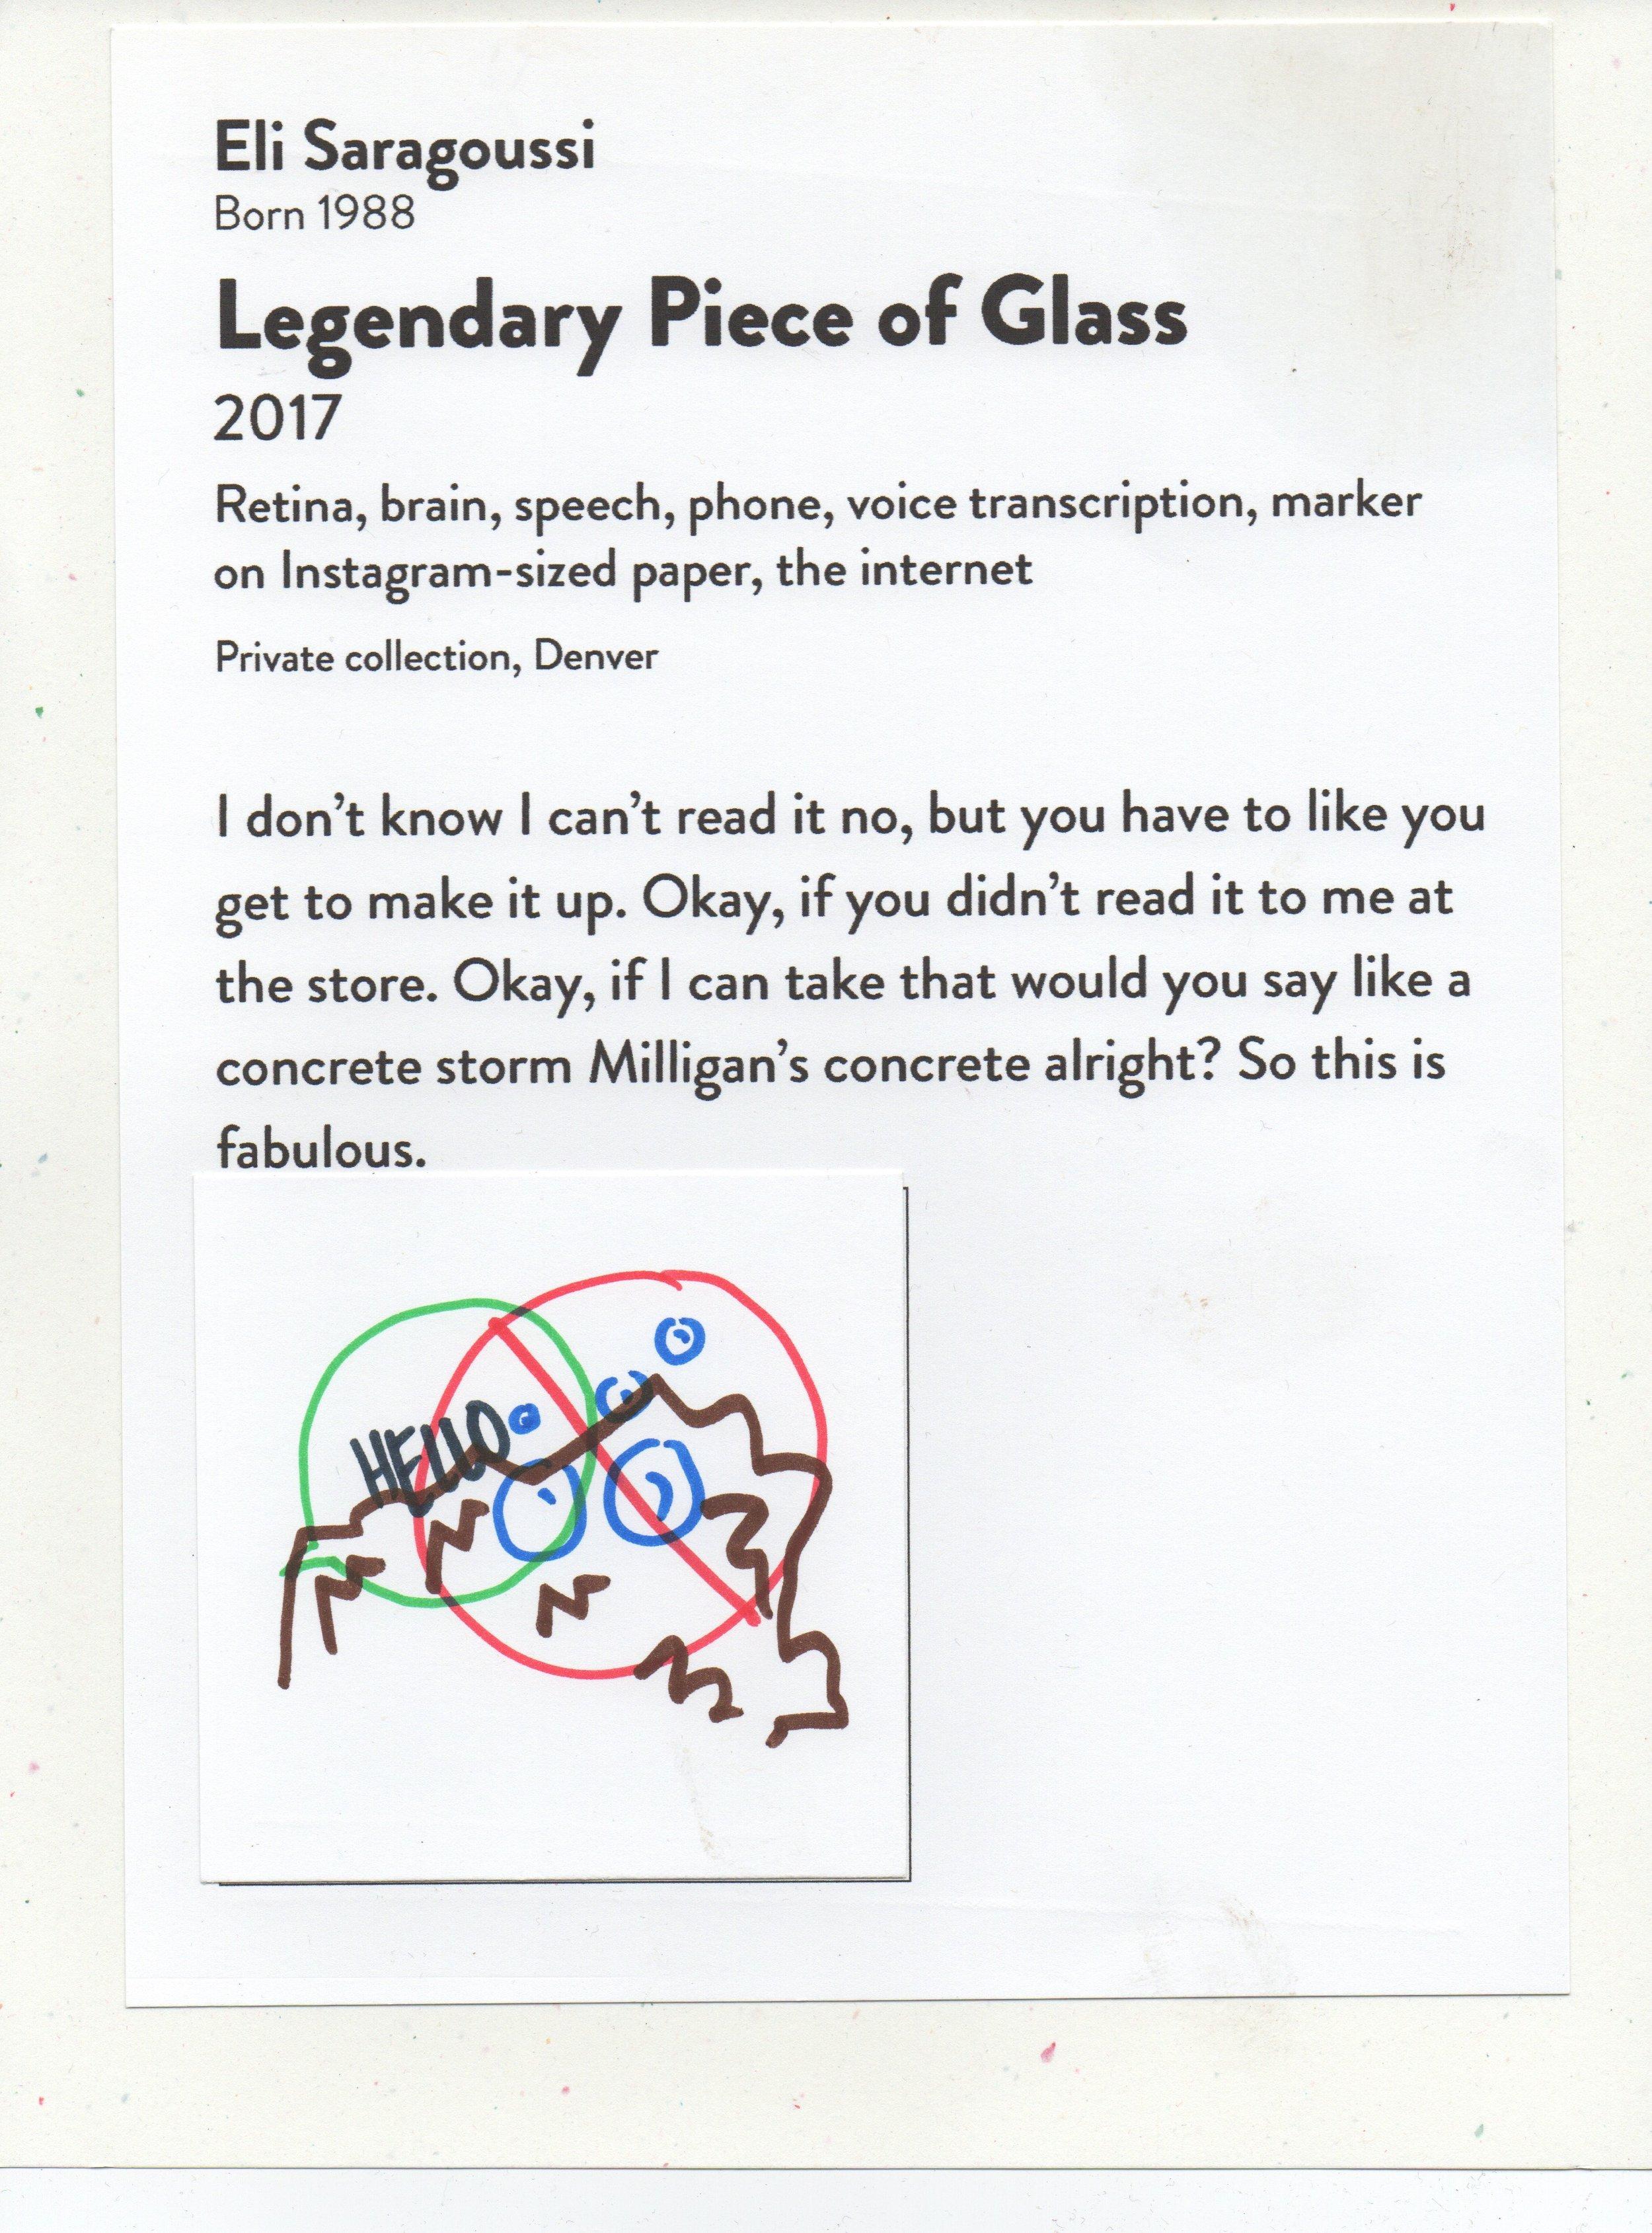 Legendary Piece of Glass DAM Untitled April 28, 2017.jpeg